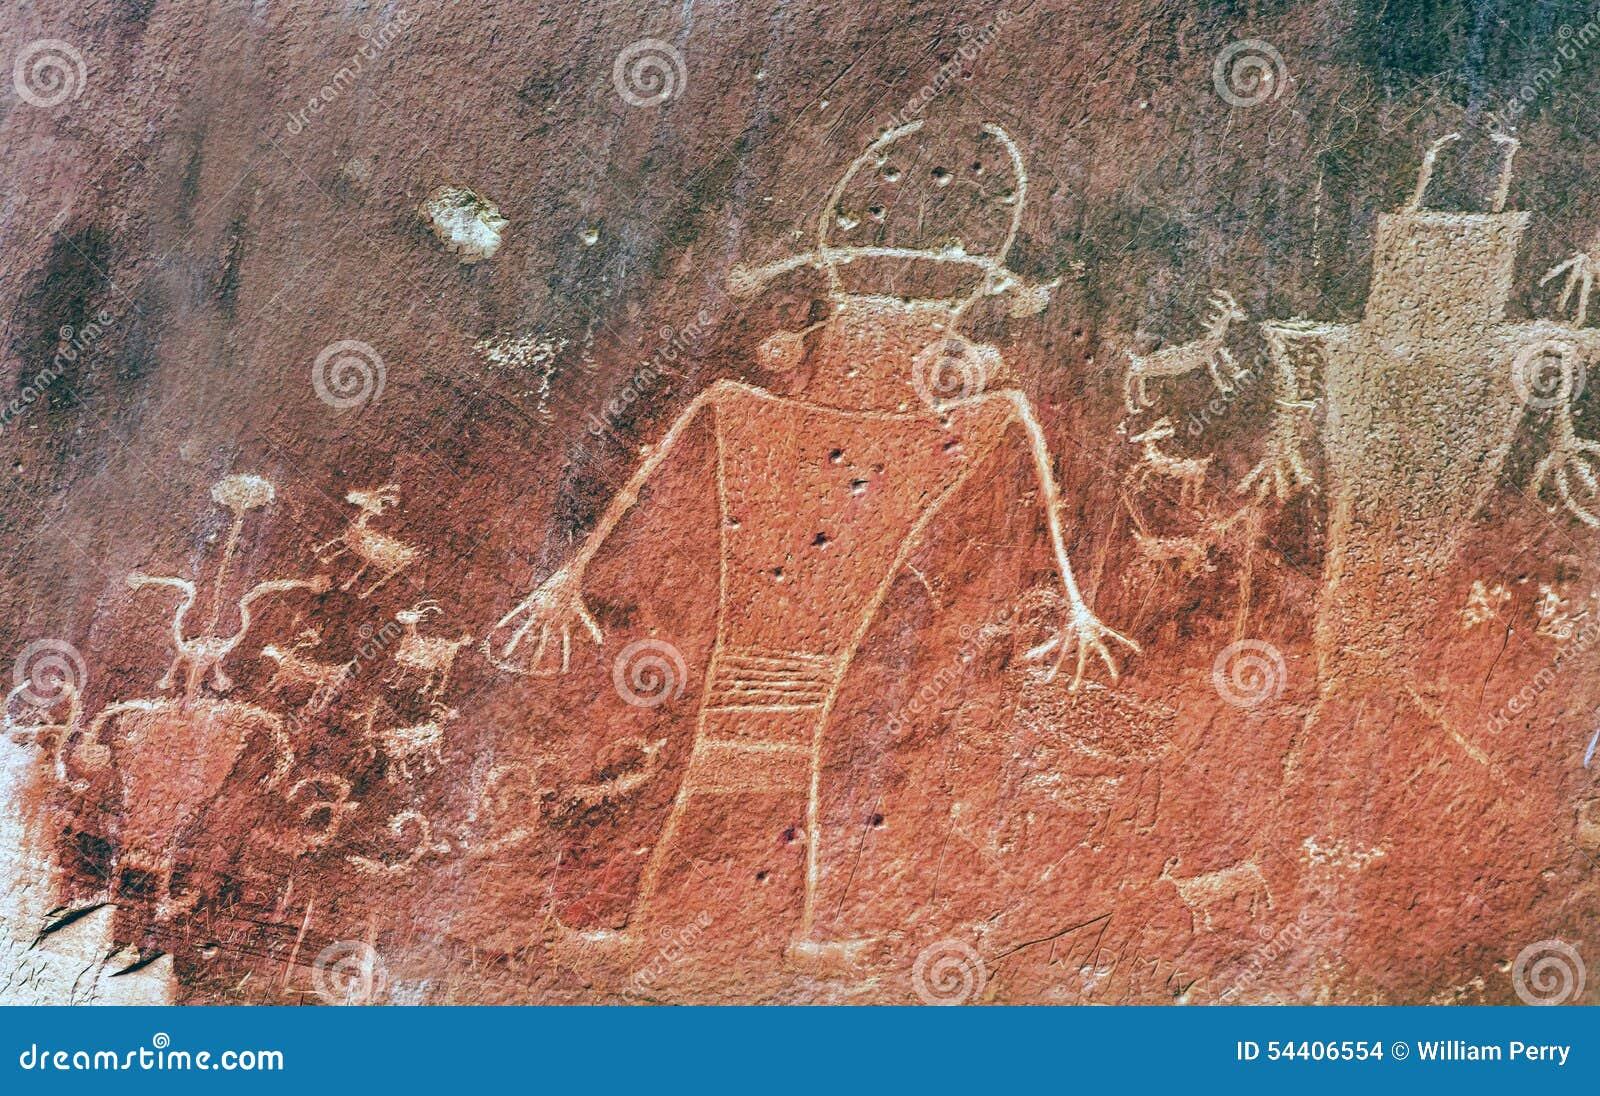 Petroglyphs Fremont αμερικανών ιθαγενών ινδικό κύριο εθνικό πάρκο σκοπέλων